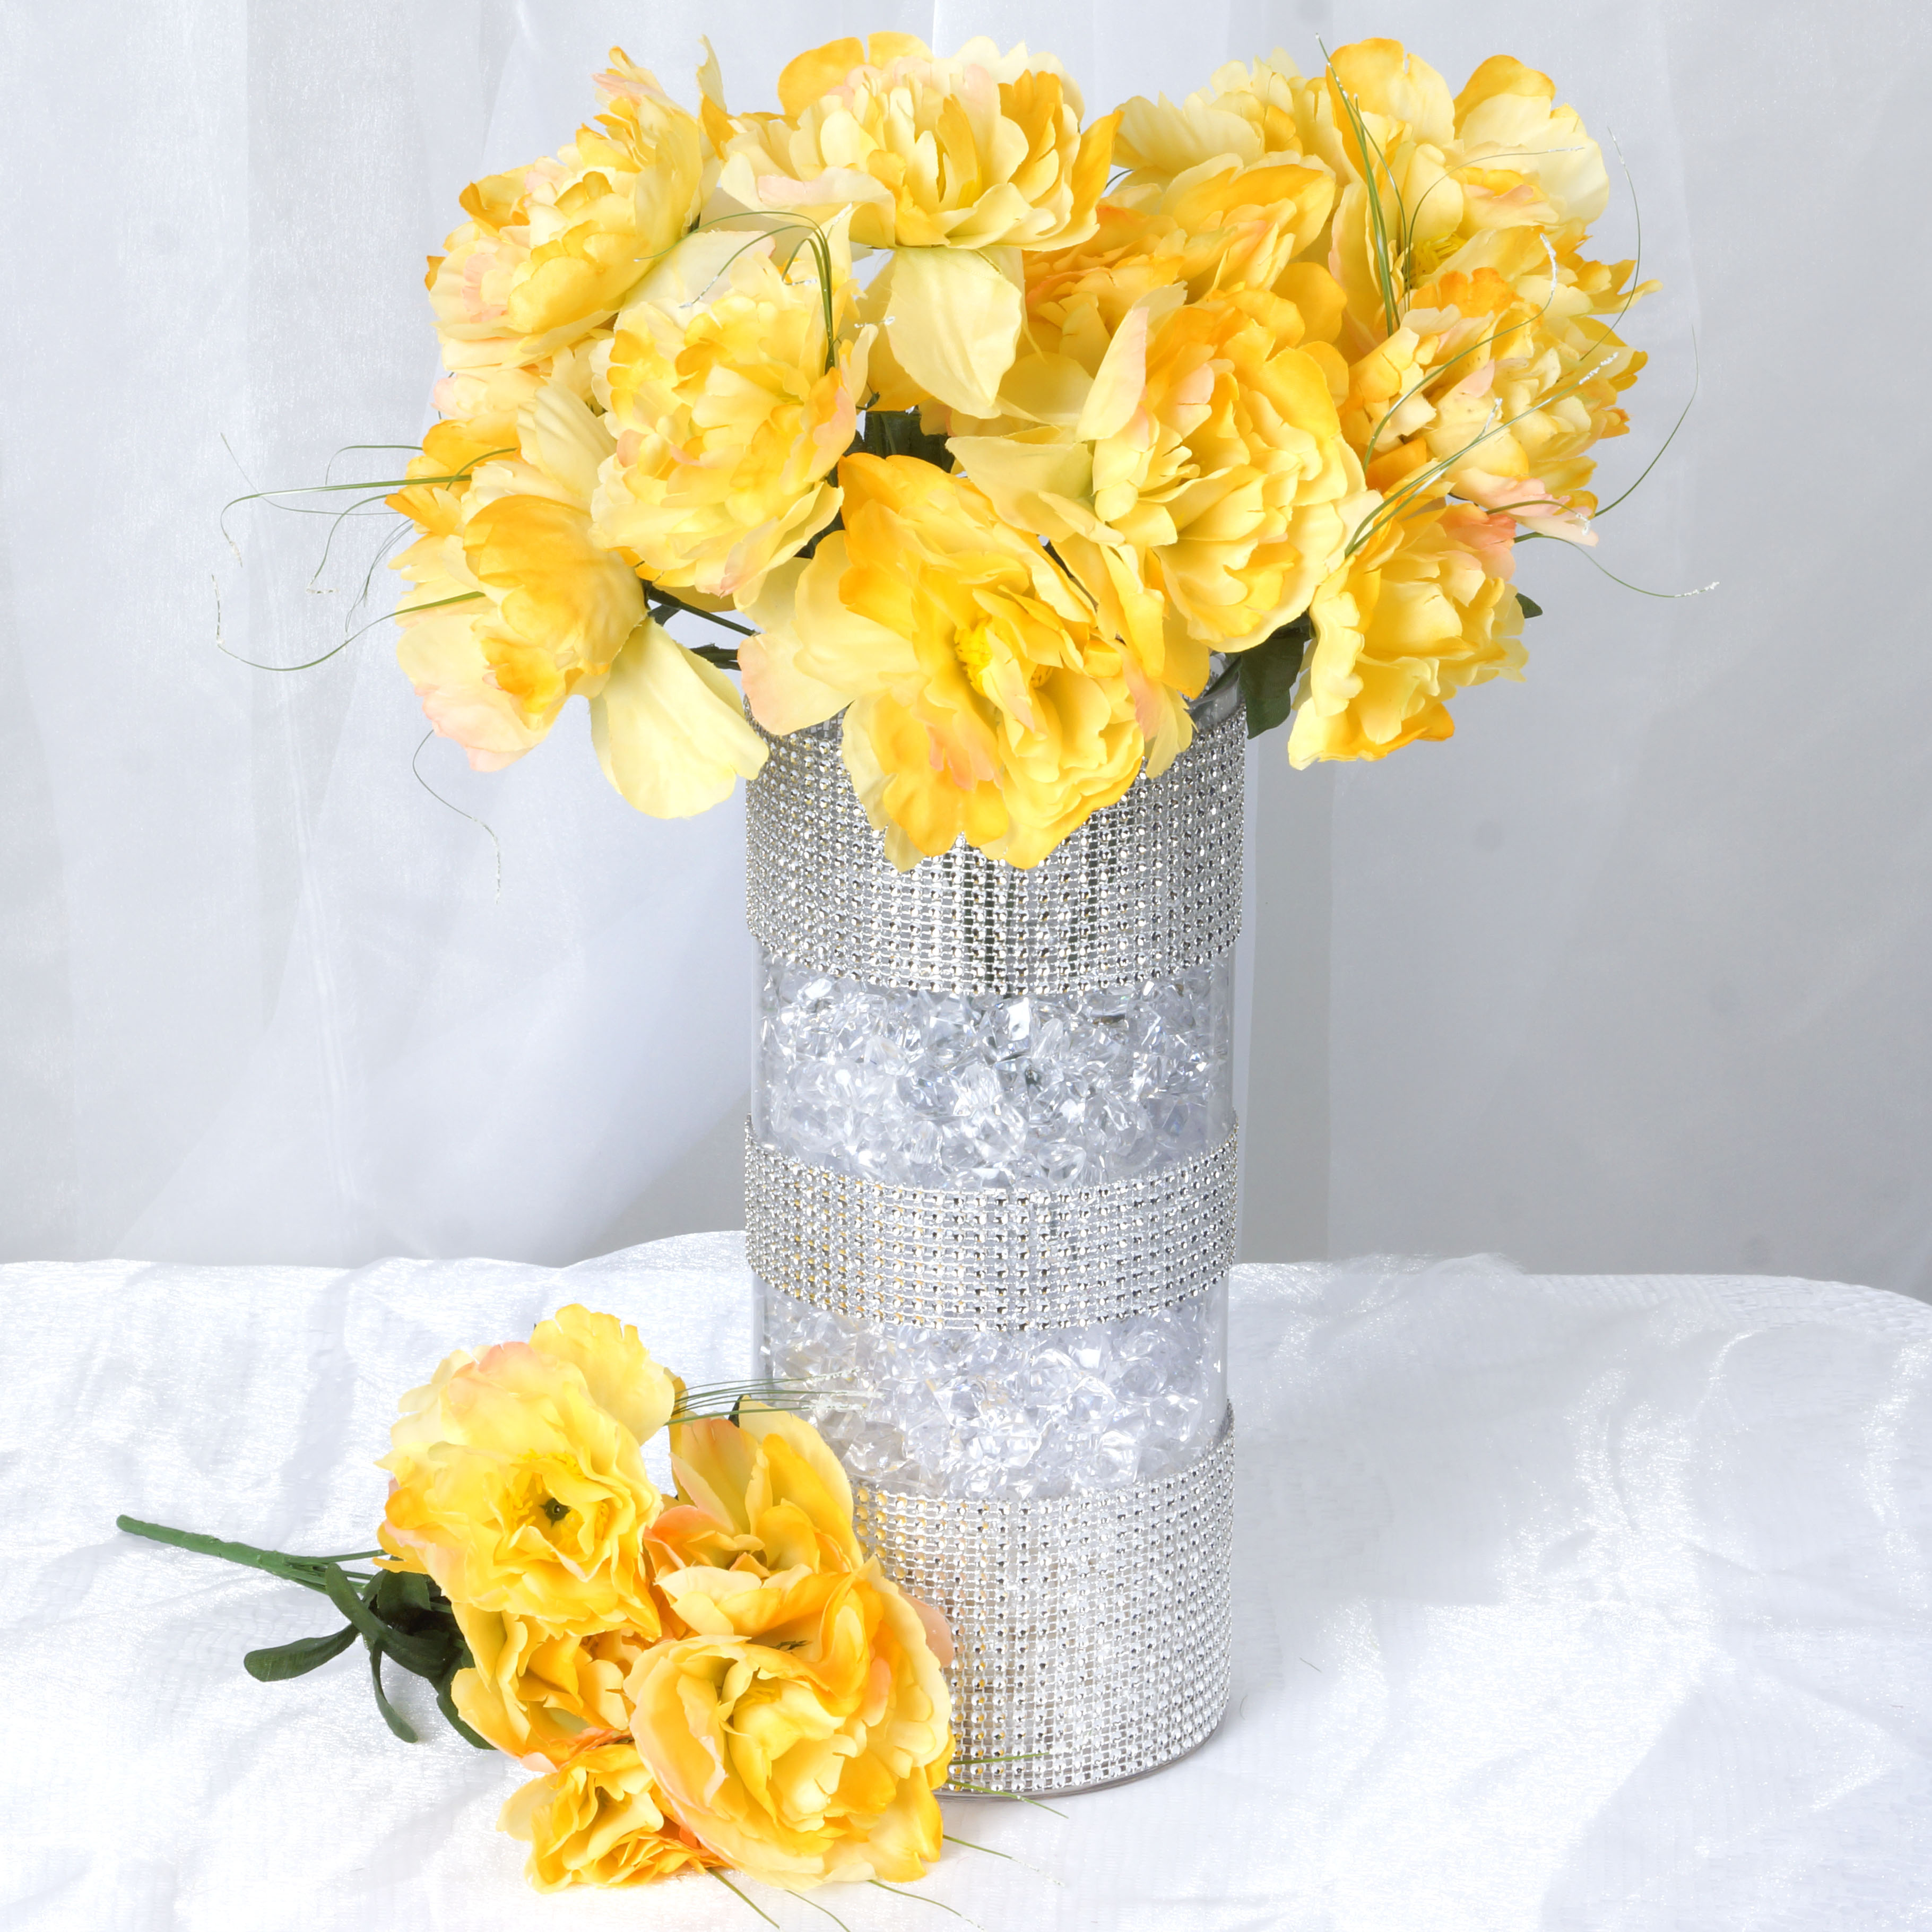 BalsaCircle 60 Silk Peony Flowers - DIY Peonies Home Wedding Party Artificial Bouquets Arrangements Centerpieces